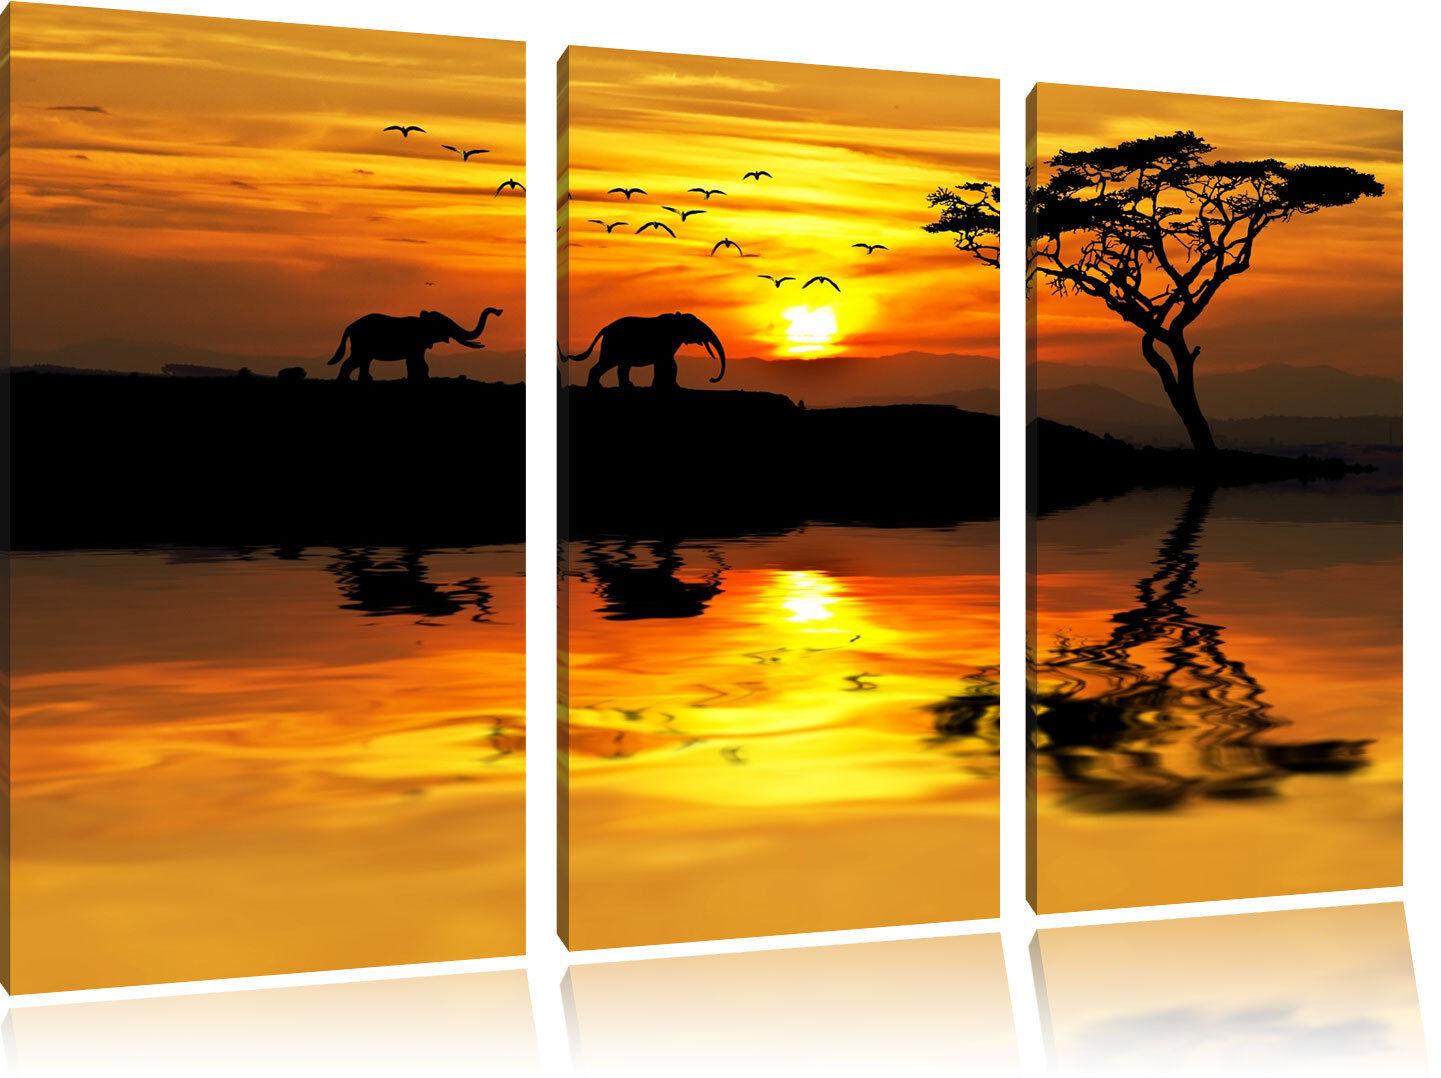 Elefanti in Africano Steppa 3-Teiler Quadro su Tel Decorazione Parete Stampa